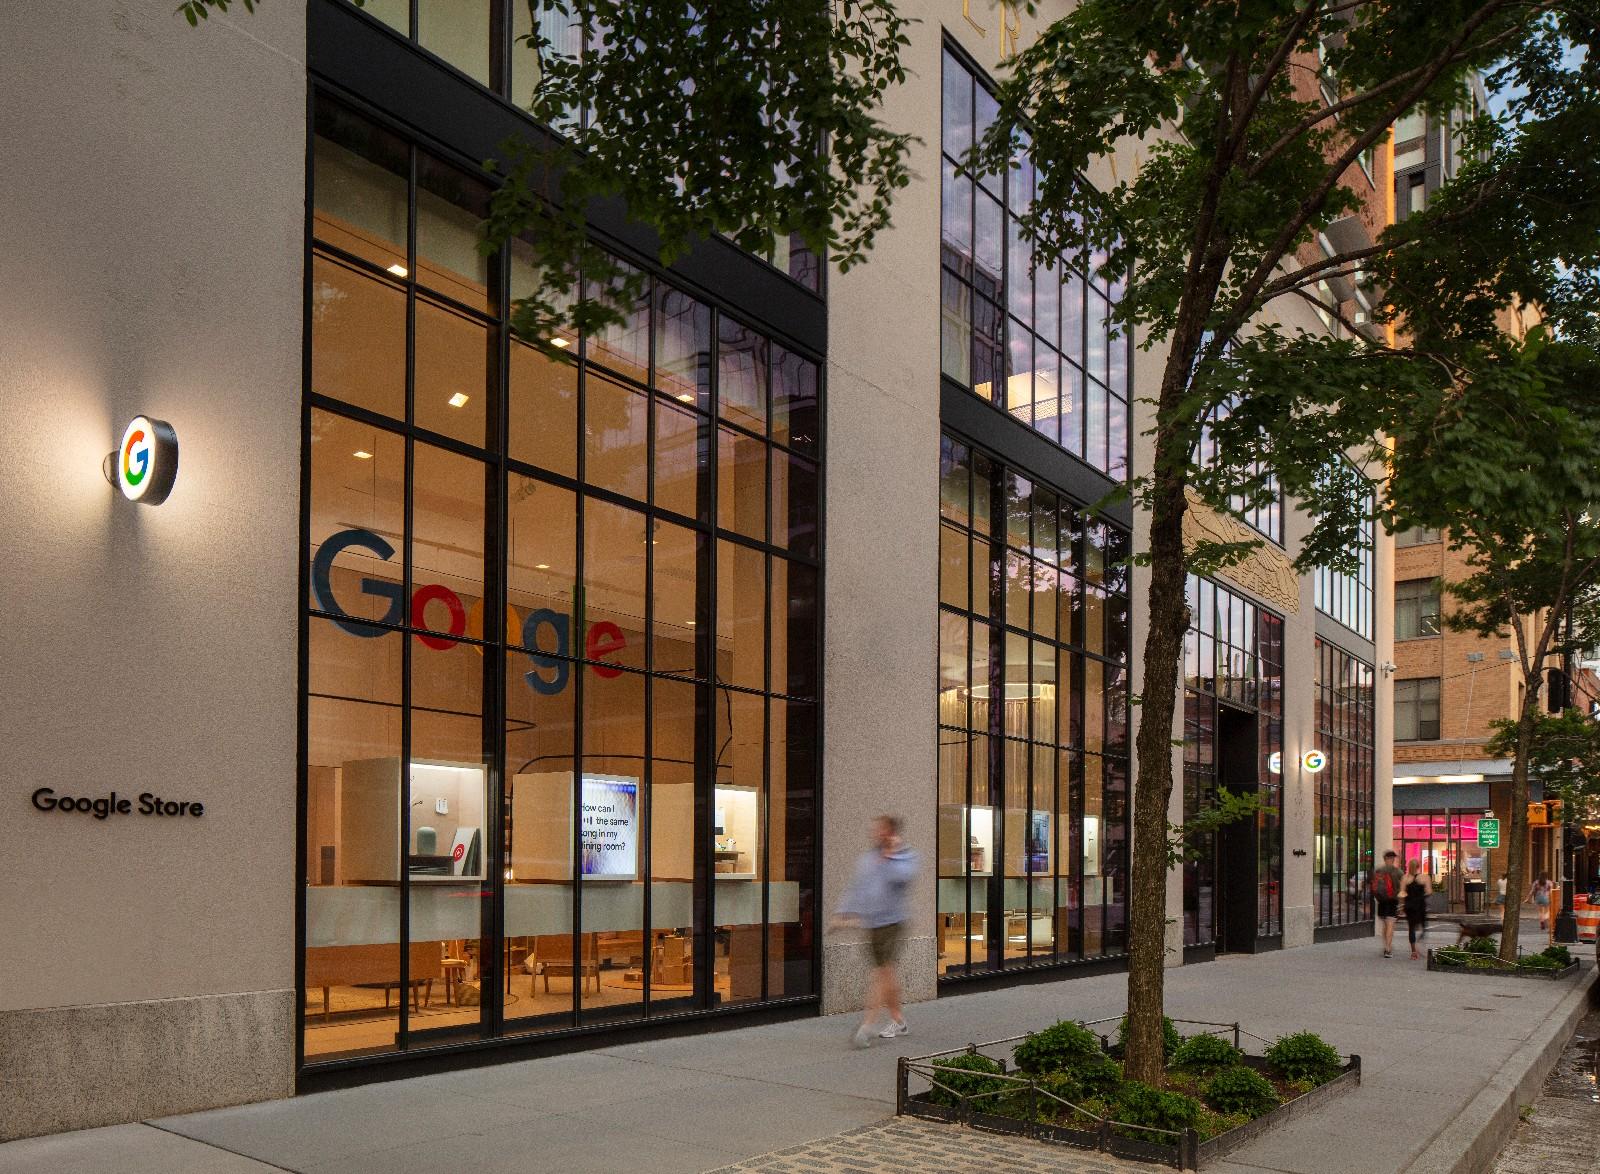 <p>Google Store Chelsea. Exterior facade.</p>